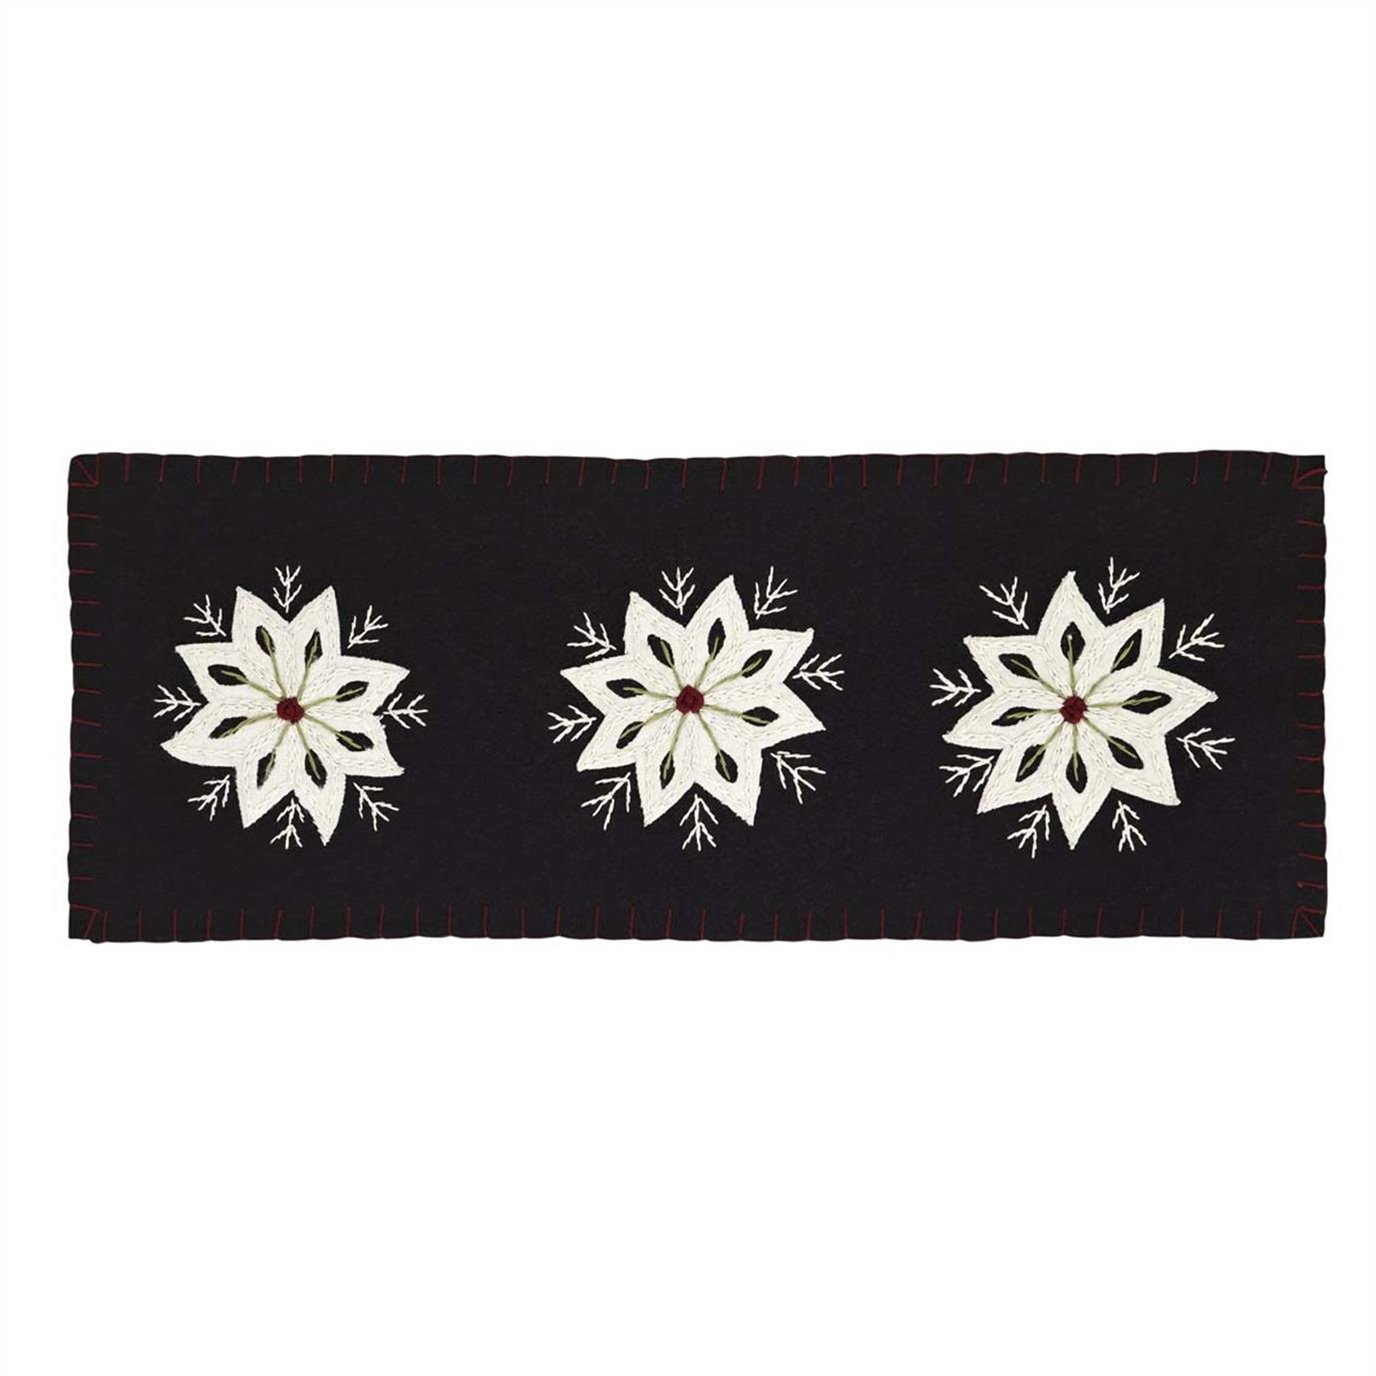 Christmas Snowflake Runner Felt Embroidery 8x24